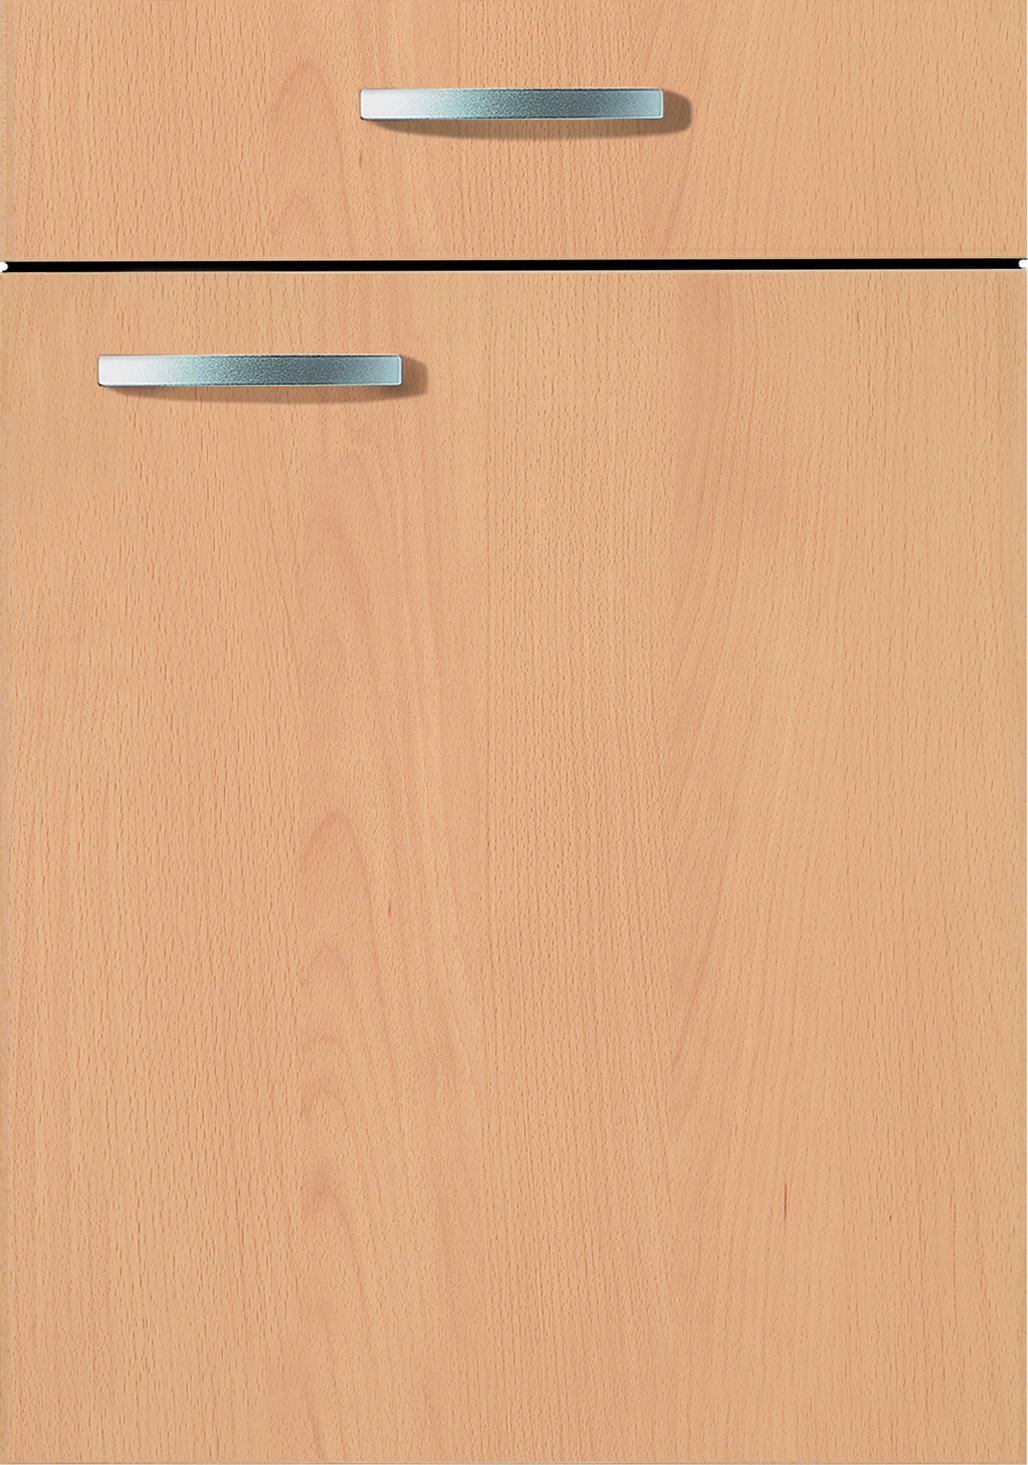 k chenblock 280cm in buche mit geschirrsp ler m bel kurz. Black Bedroom Furniture Sets. Home Design Ideas